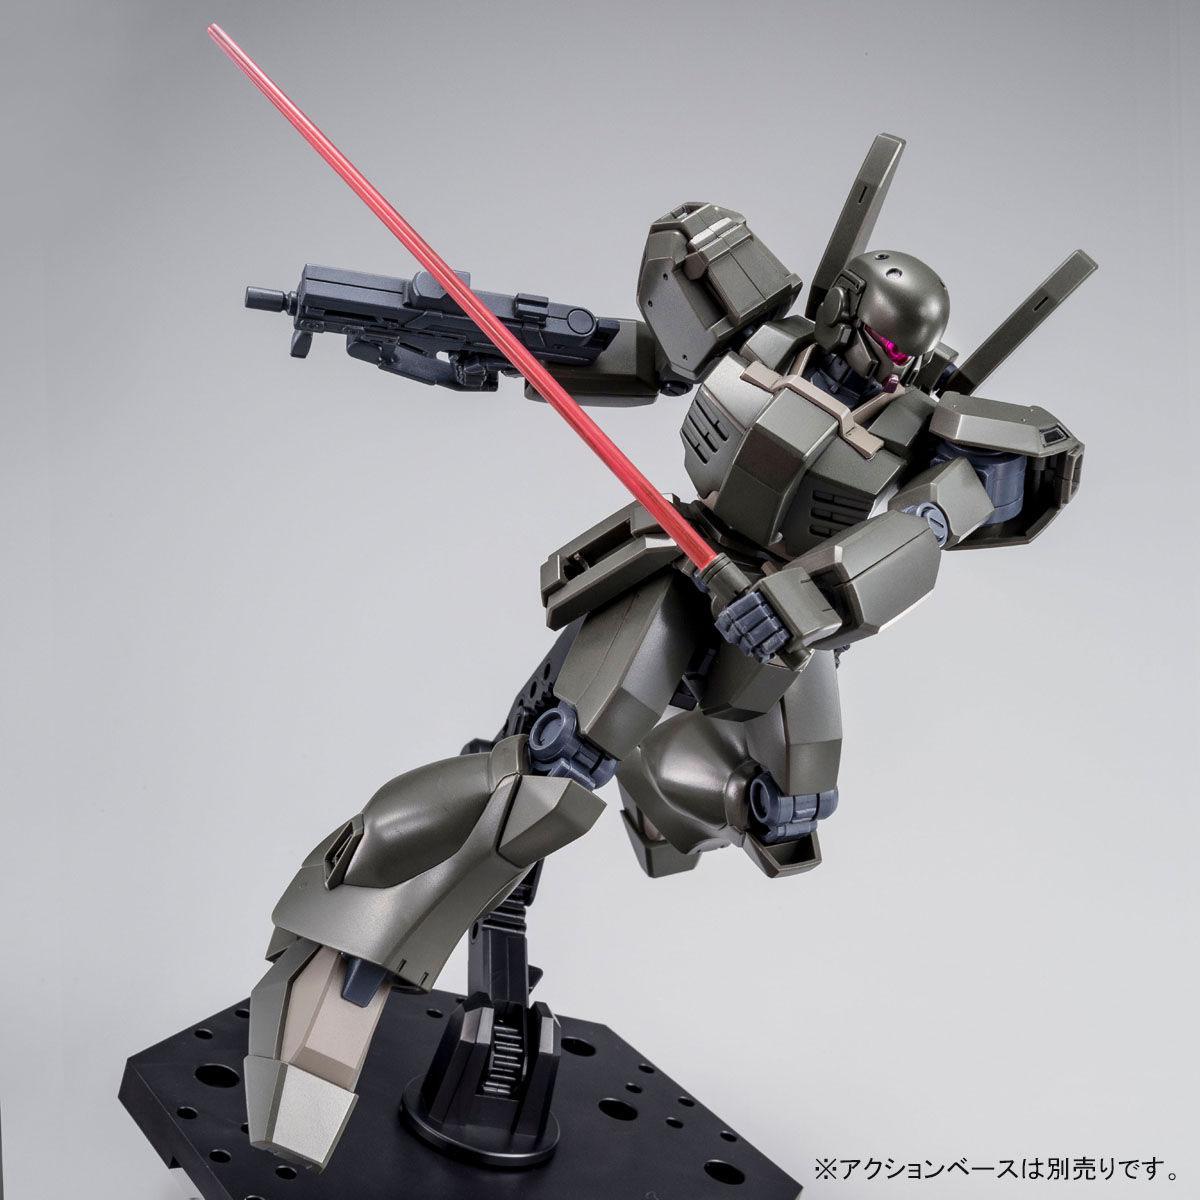 HG 1/144『ジェガンD型 (護衛隊仕様)』機動戦士ガンダムNT プラモデル-007